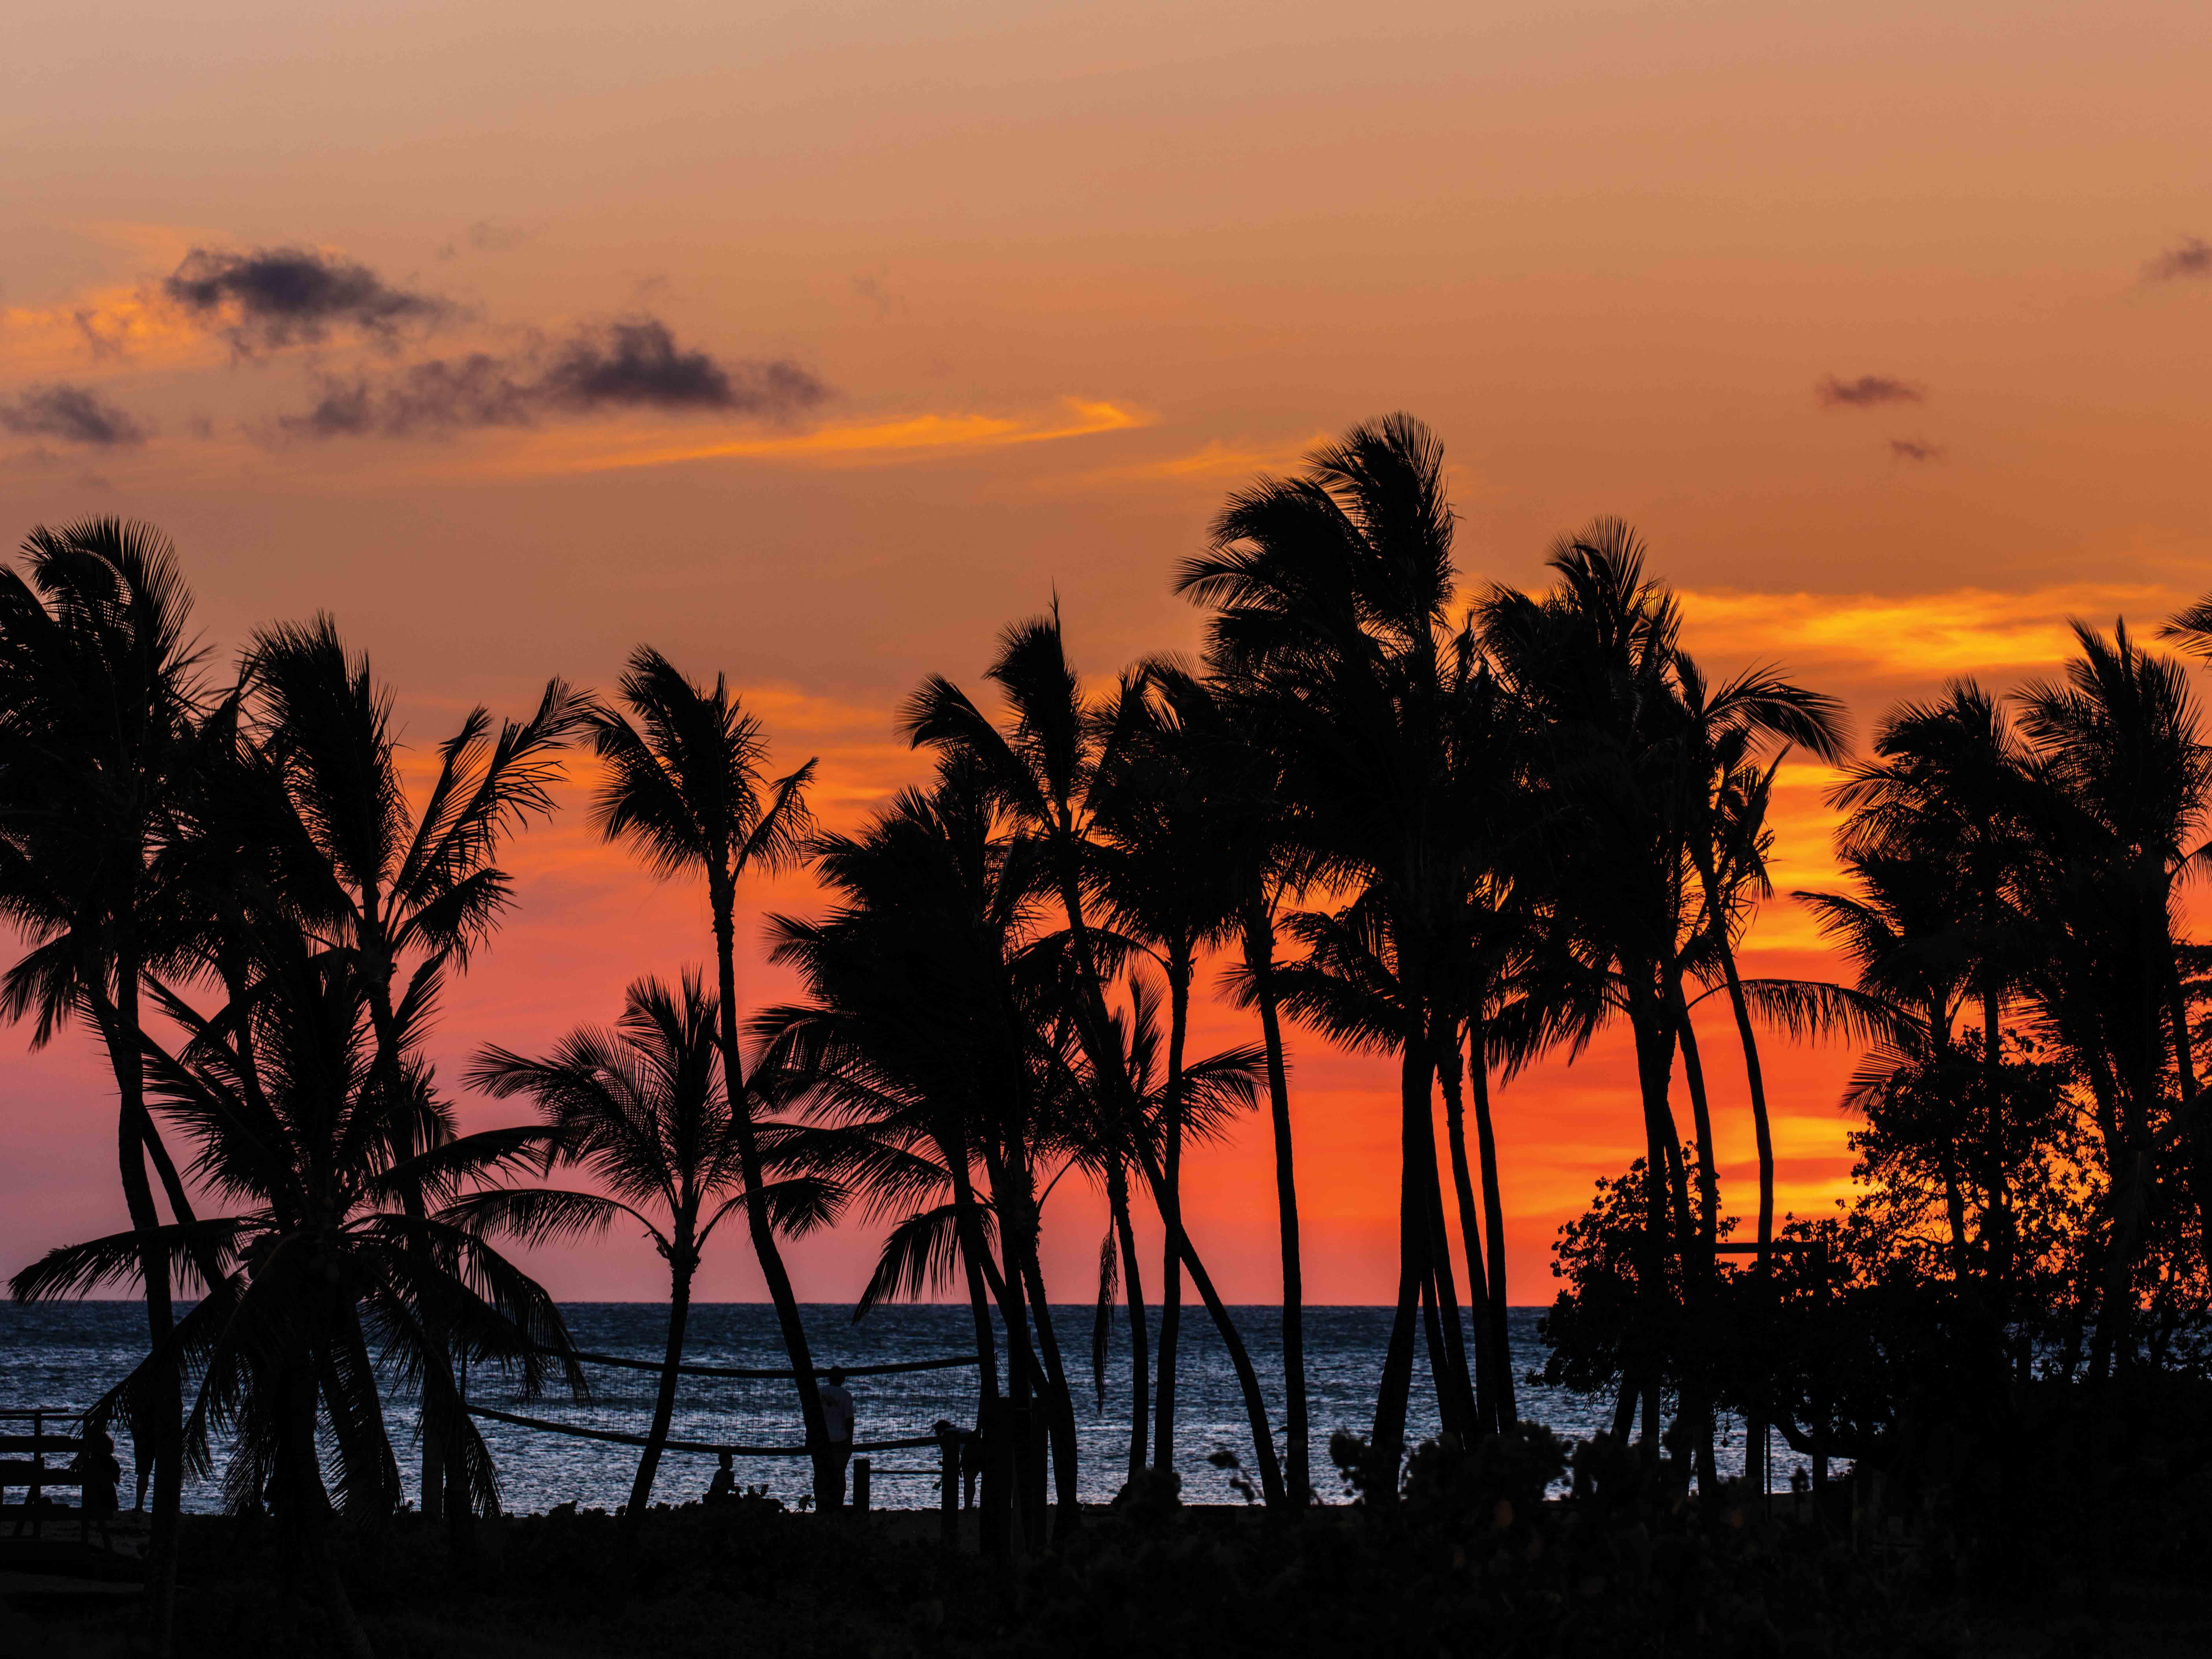 Marriott's Waikoloa Ocean Club Kona Sunset. Marriott's Waikoloa Ocean Club is located in Waikoloa Beach, Big Island, Hawai'i United States.